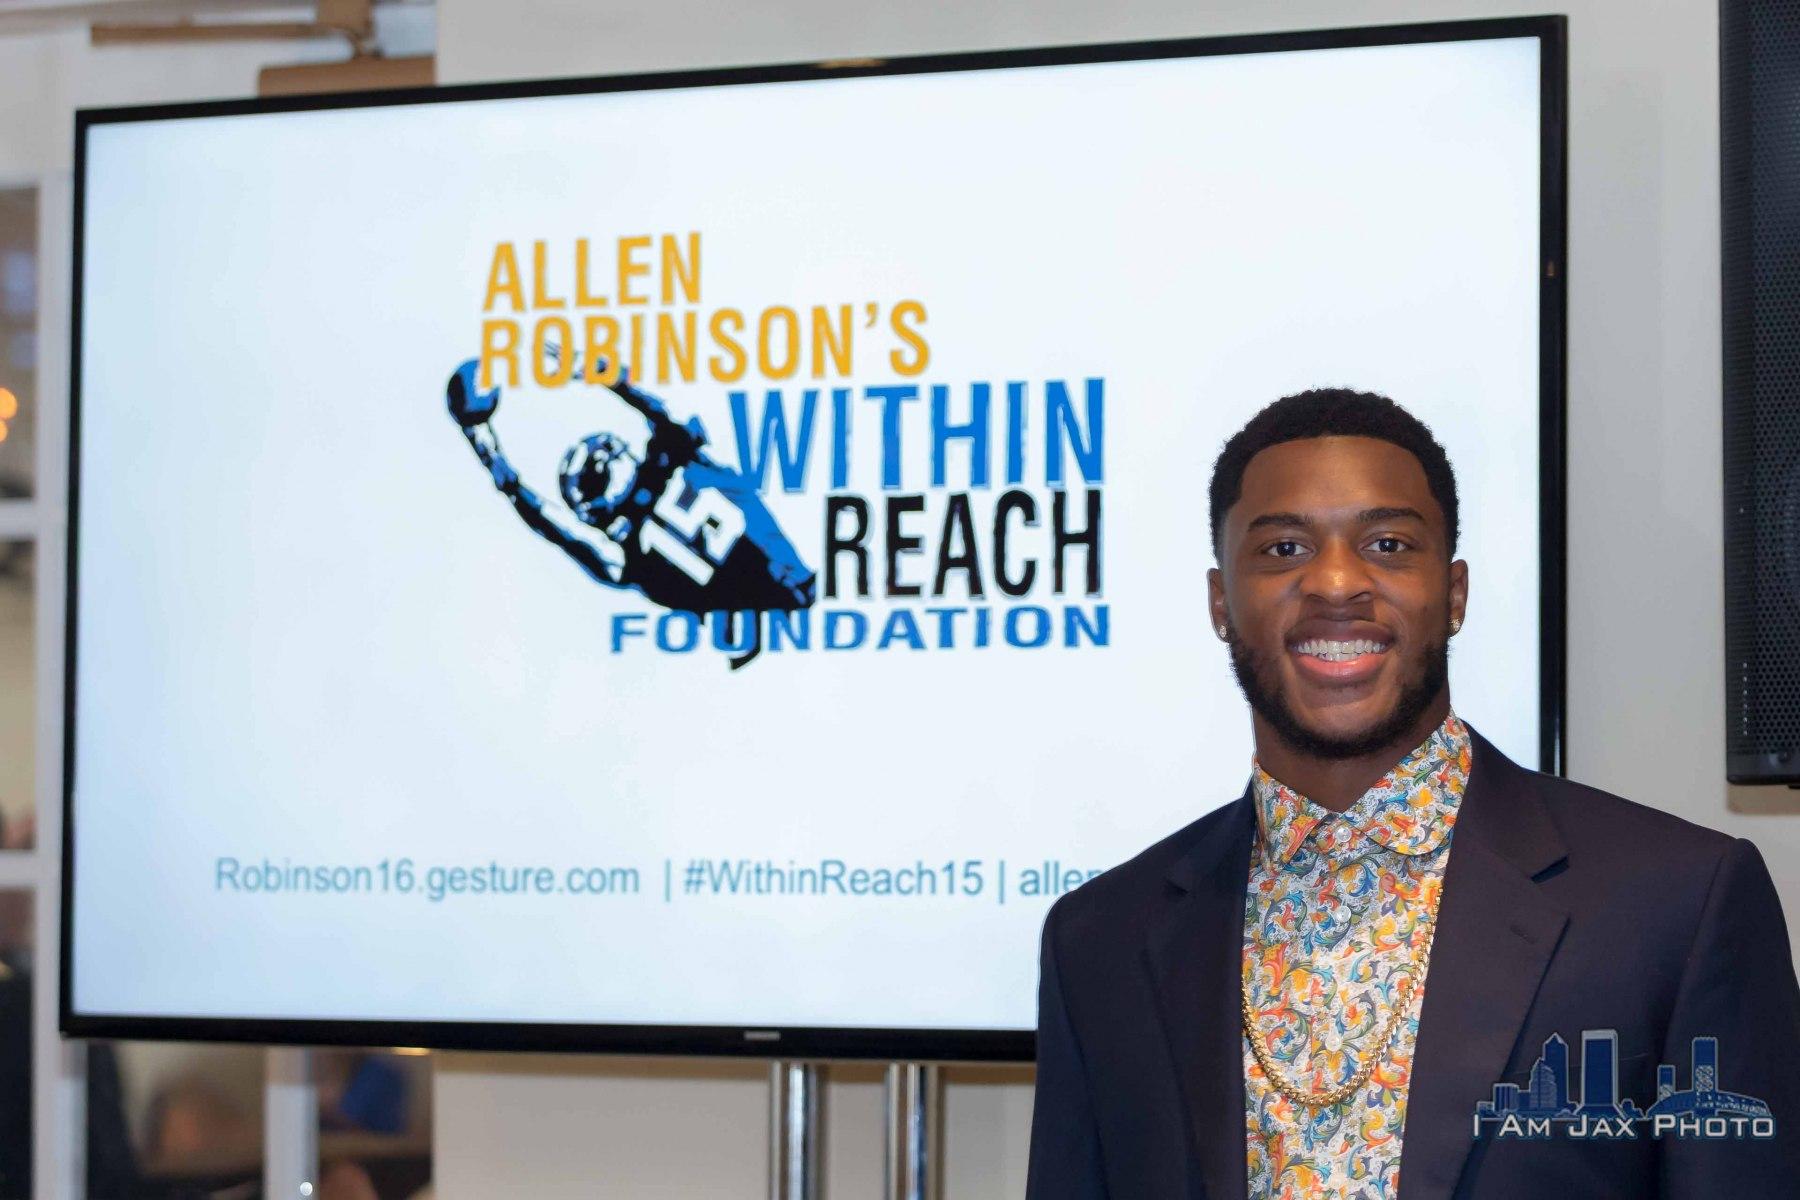 Allen Robinson Fundraiser - Jax, FL